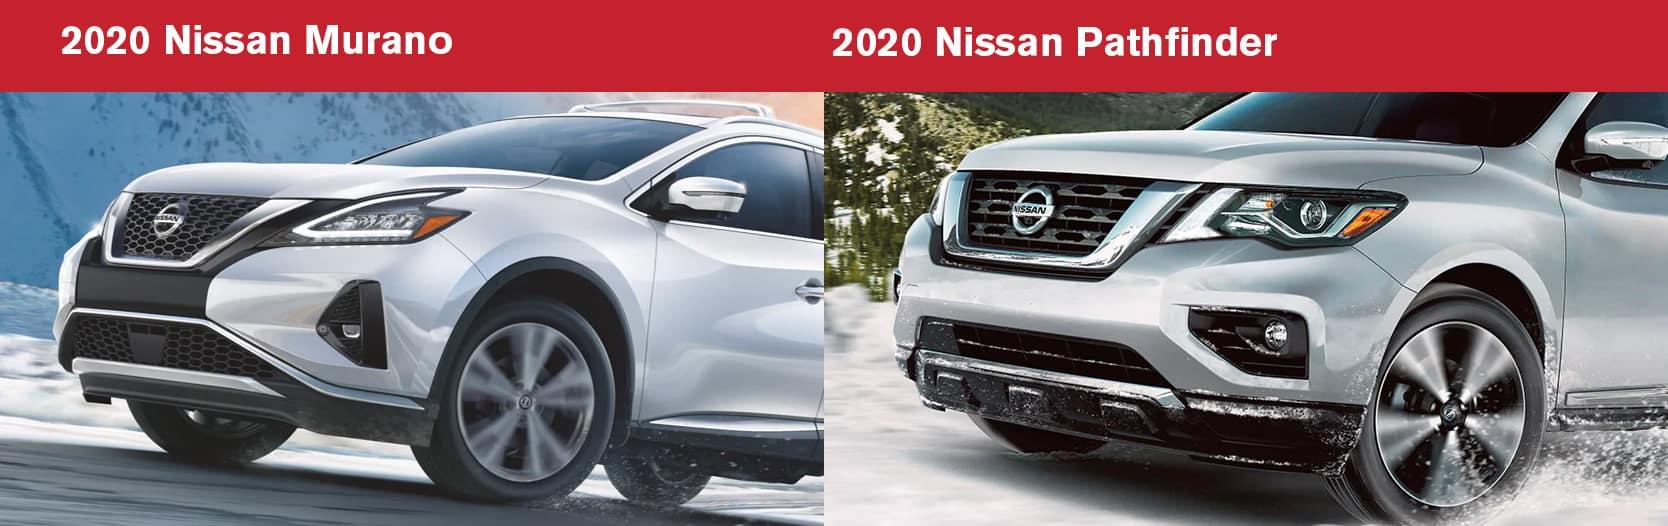 2020 Nissan Murano vs 2020 Nissan Pathfinder Performance